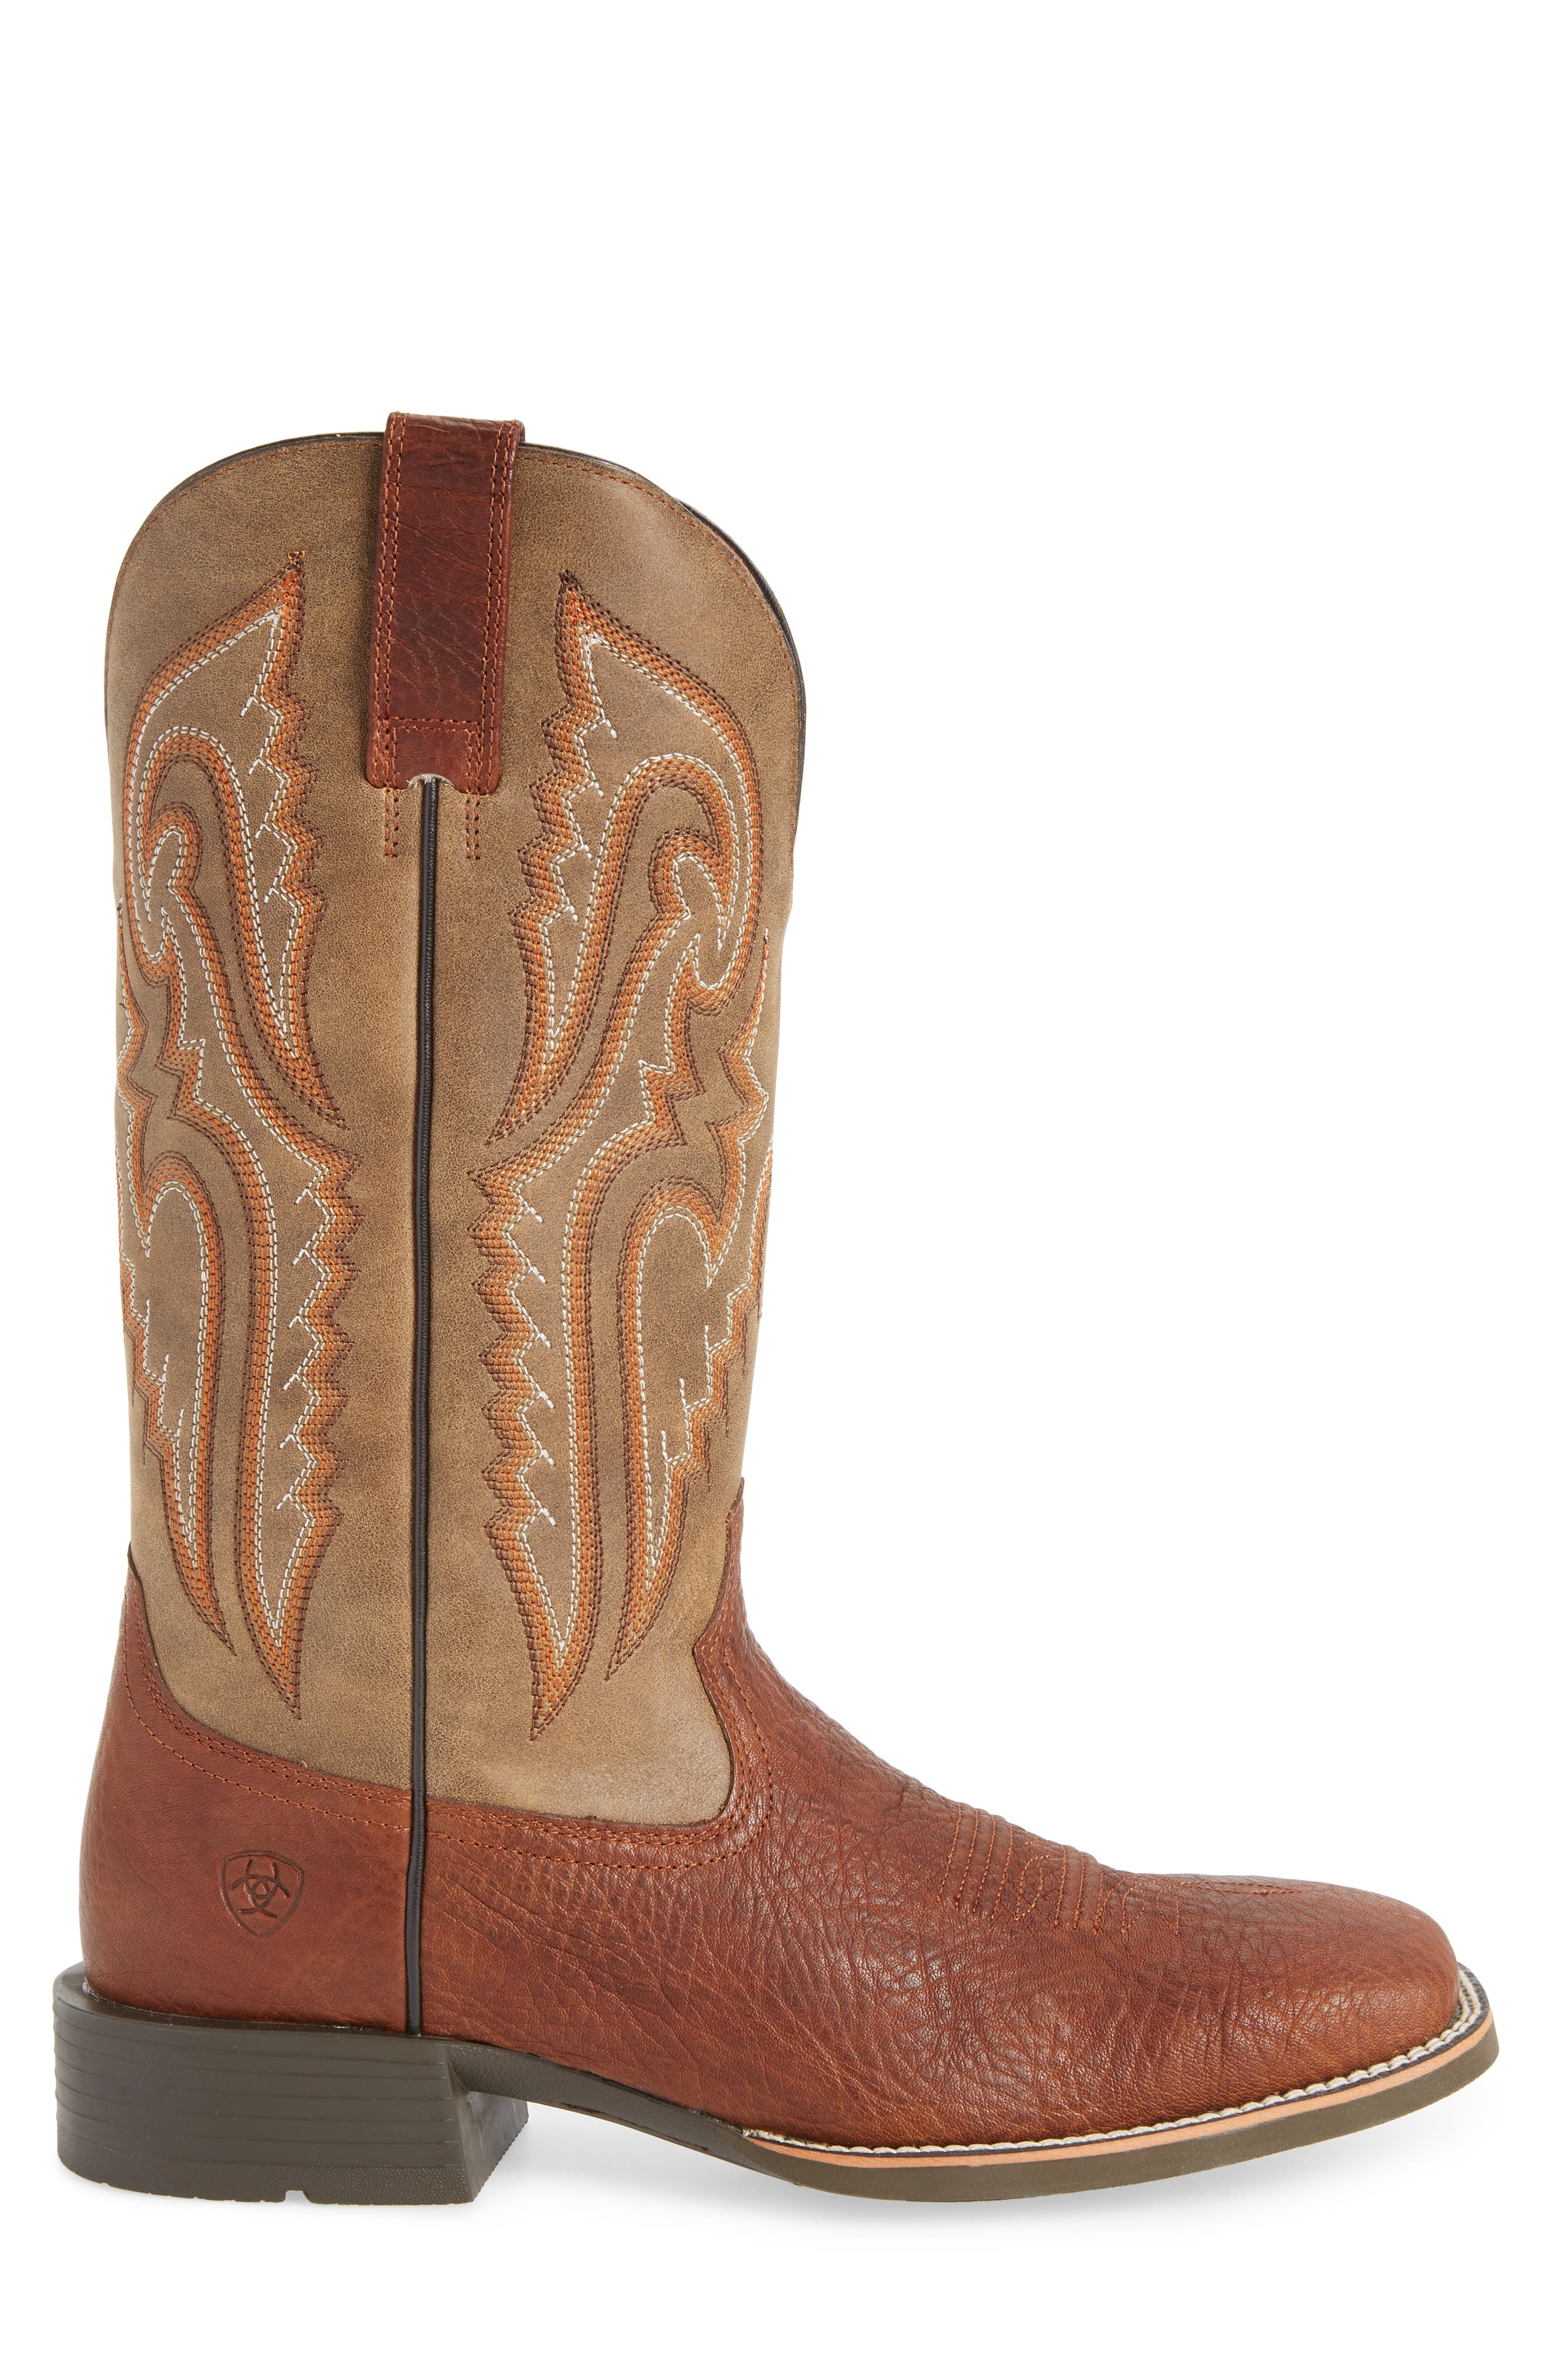 Heritage Latigo Square Toe Cowboy Boot,                             Alternate thumbnail 3, color,                             COGNAC/ BROWN BOMBER LEATHER